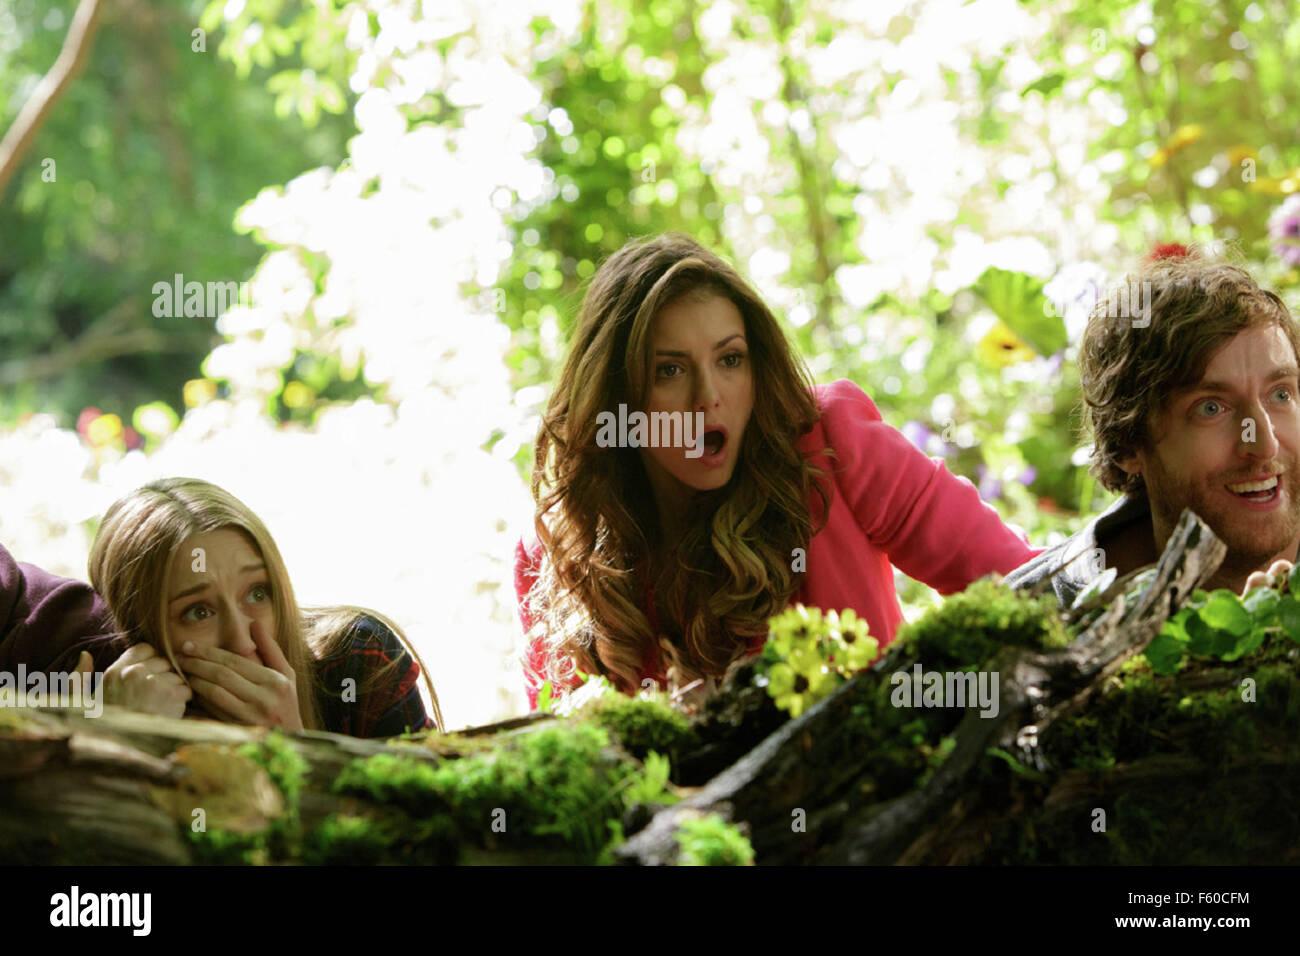 THE FINAL GIRLS (2015)  TAISSA FARMIGA, NINA DOBREV, THOMAS MIDDLEDITCH  TODD STRAUSS-SCHULSON (DIR)  MOVIESTORE - Stock Image